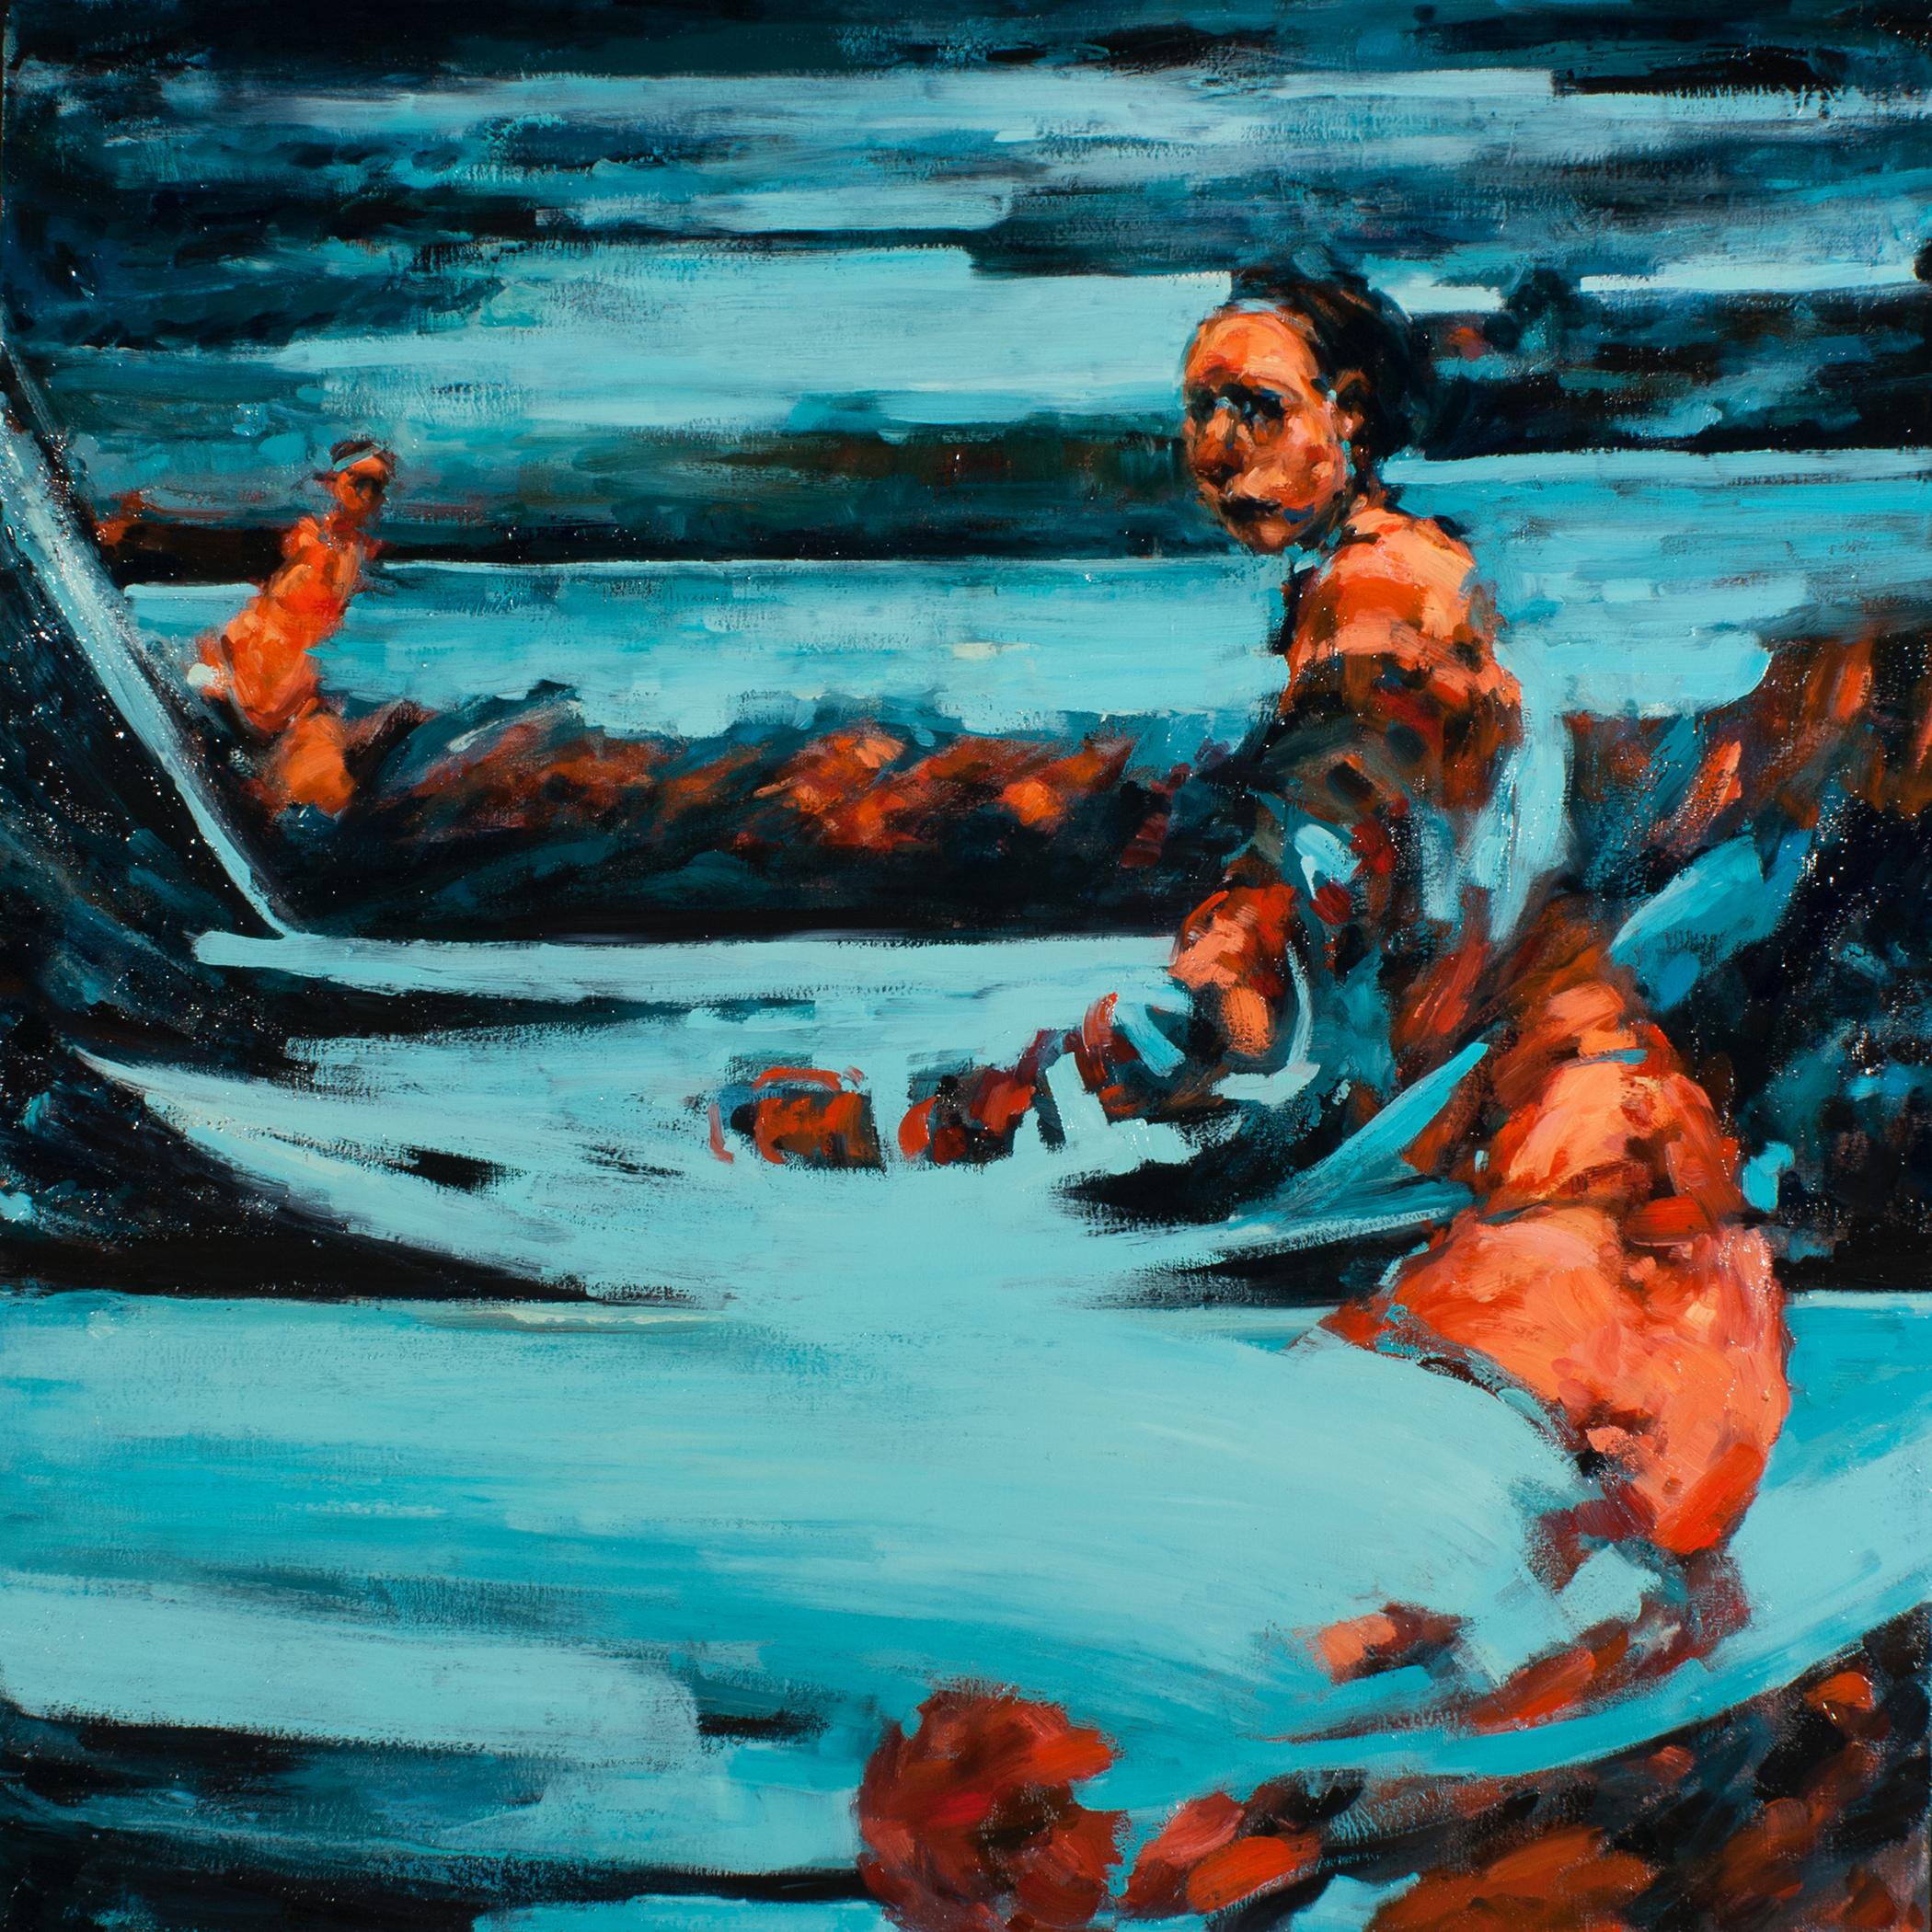 "Braced, oil on canvas, 32"" x 32"" x 2"", 2012"